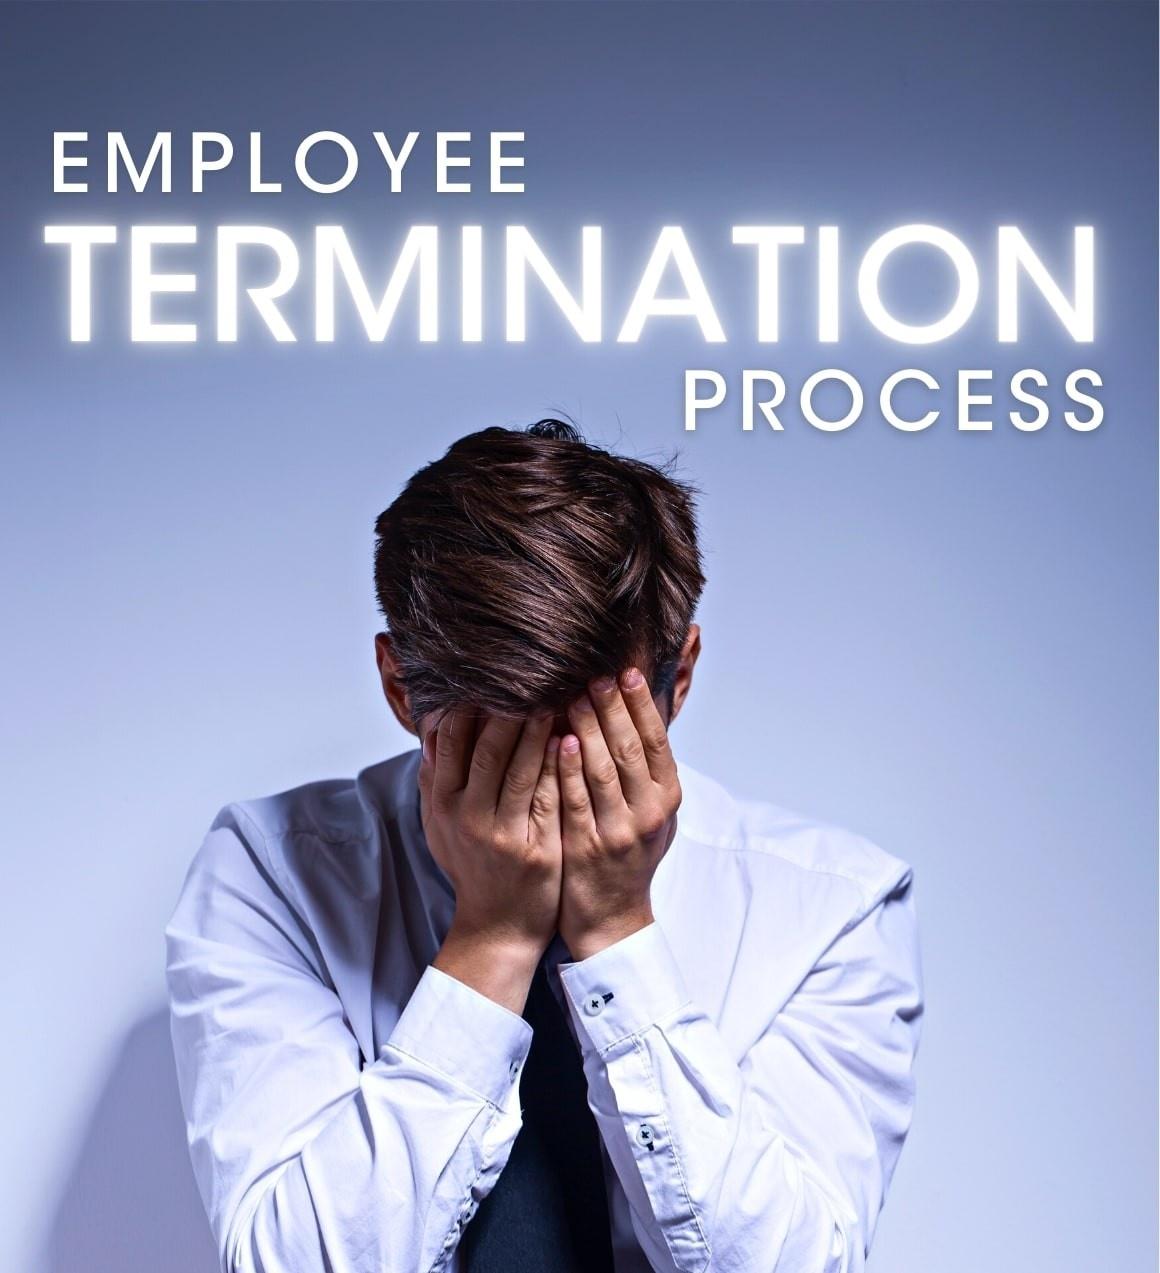 Employee termination process